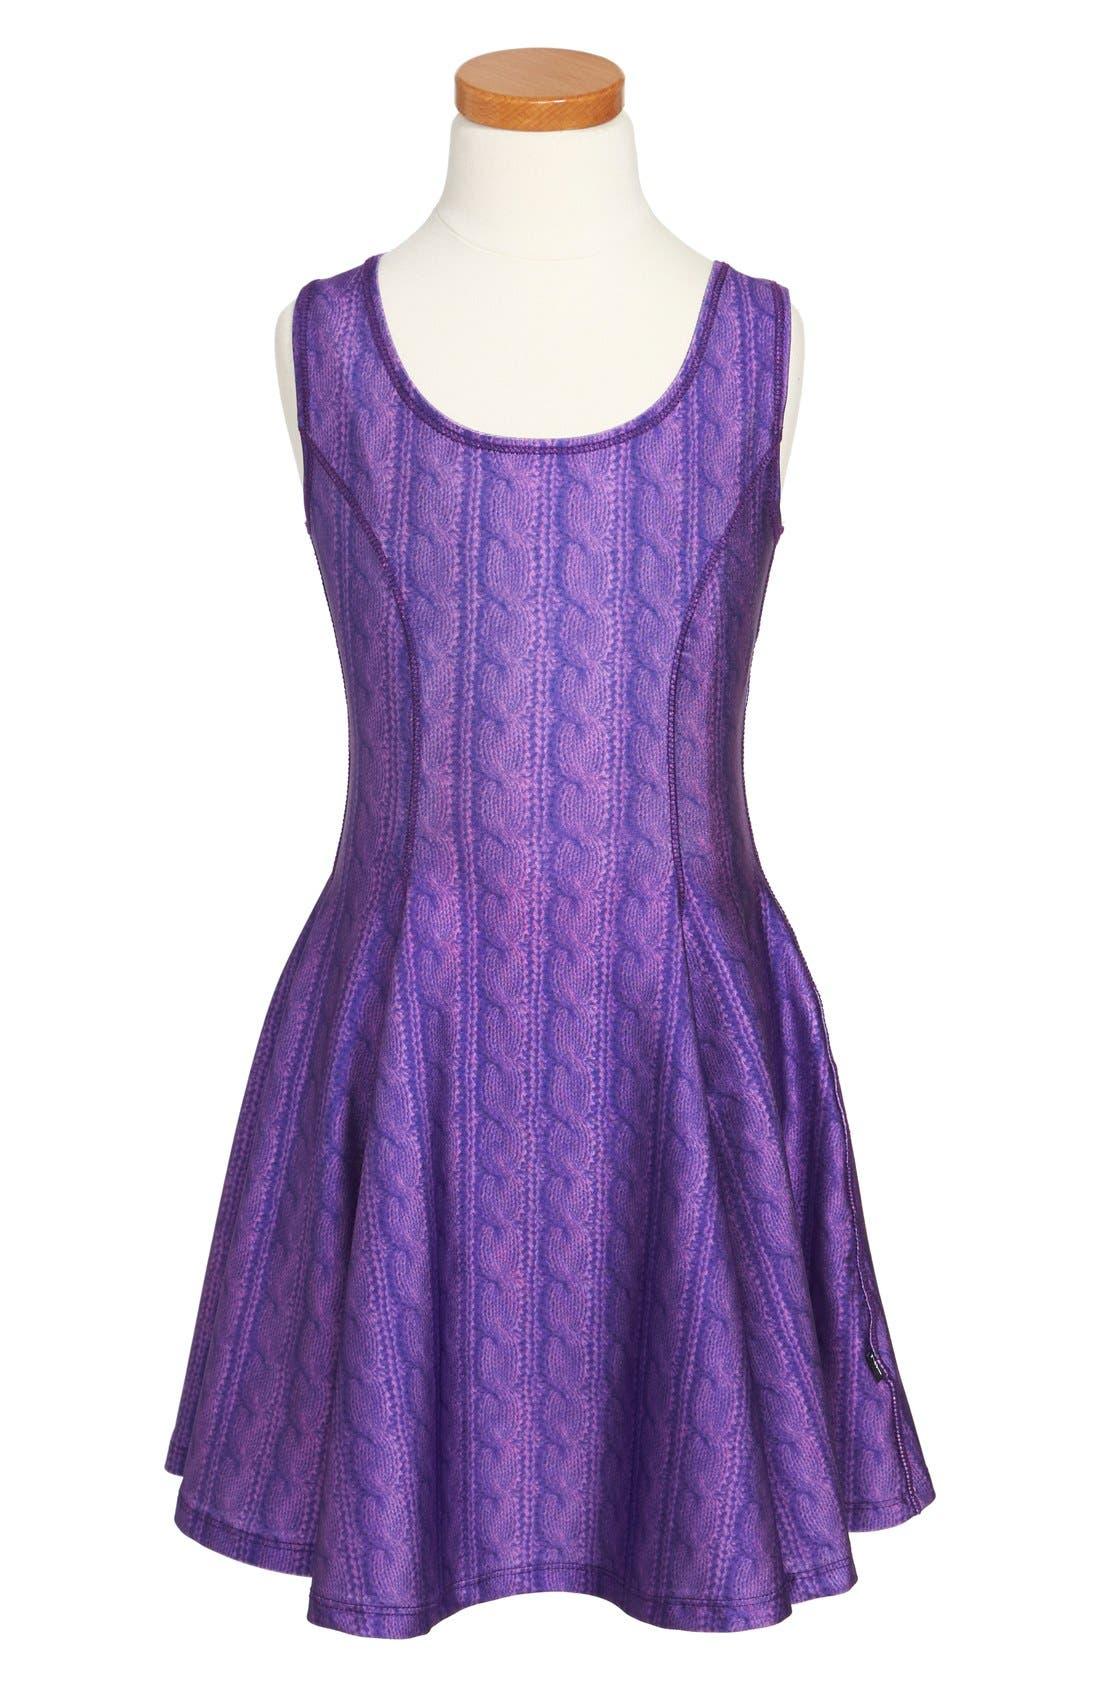 Main Image - Terez Cable Knit Dress (Big Girls)